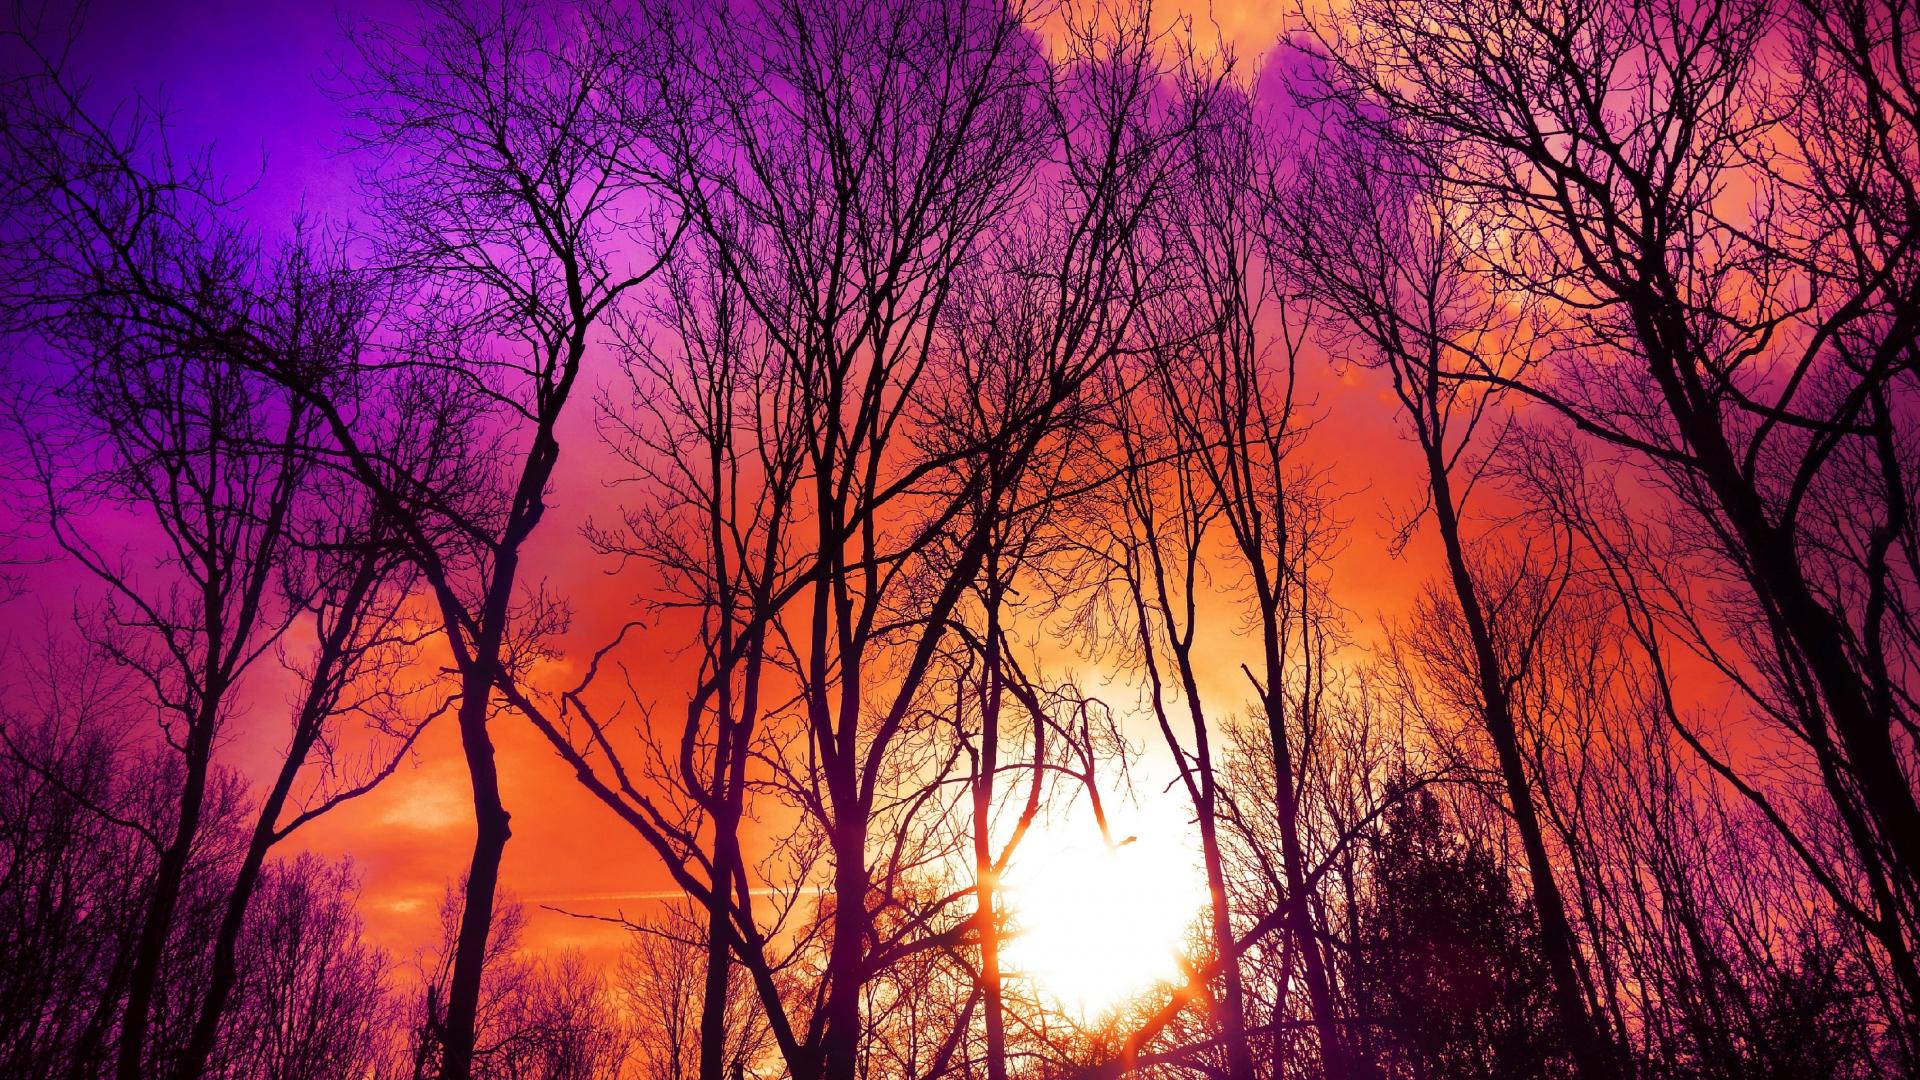 Download 1920x1080 Wallpaper Pink Skyline Tree Sky Sunset